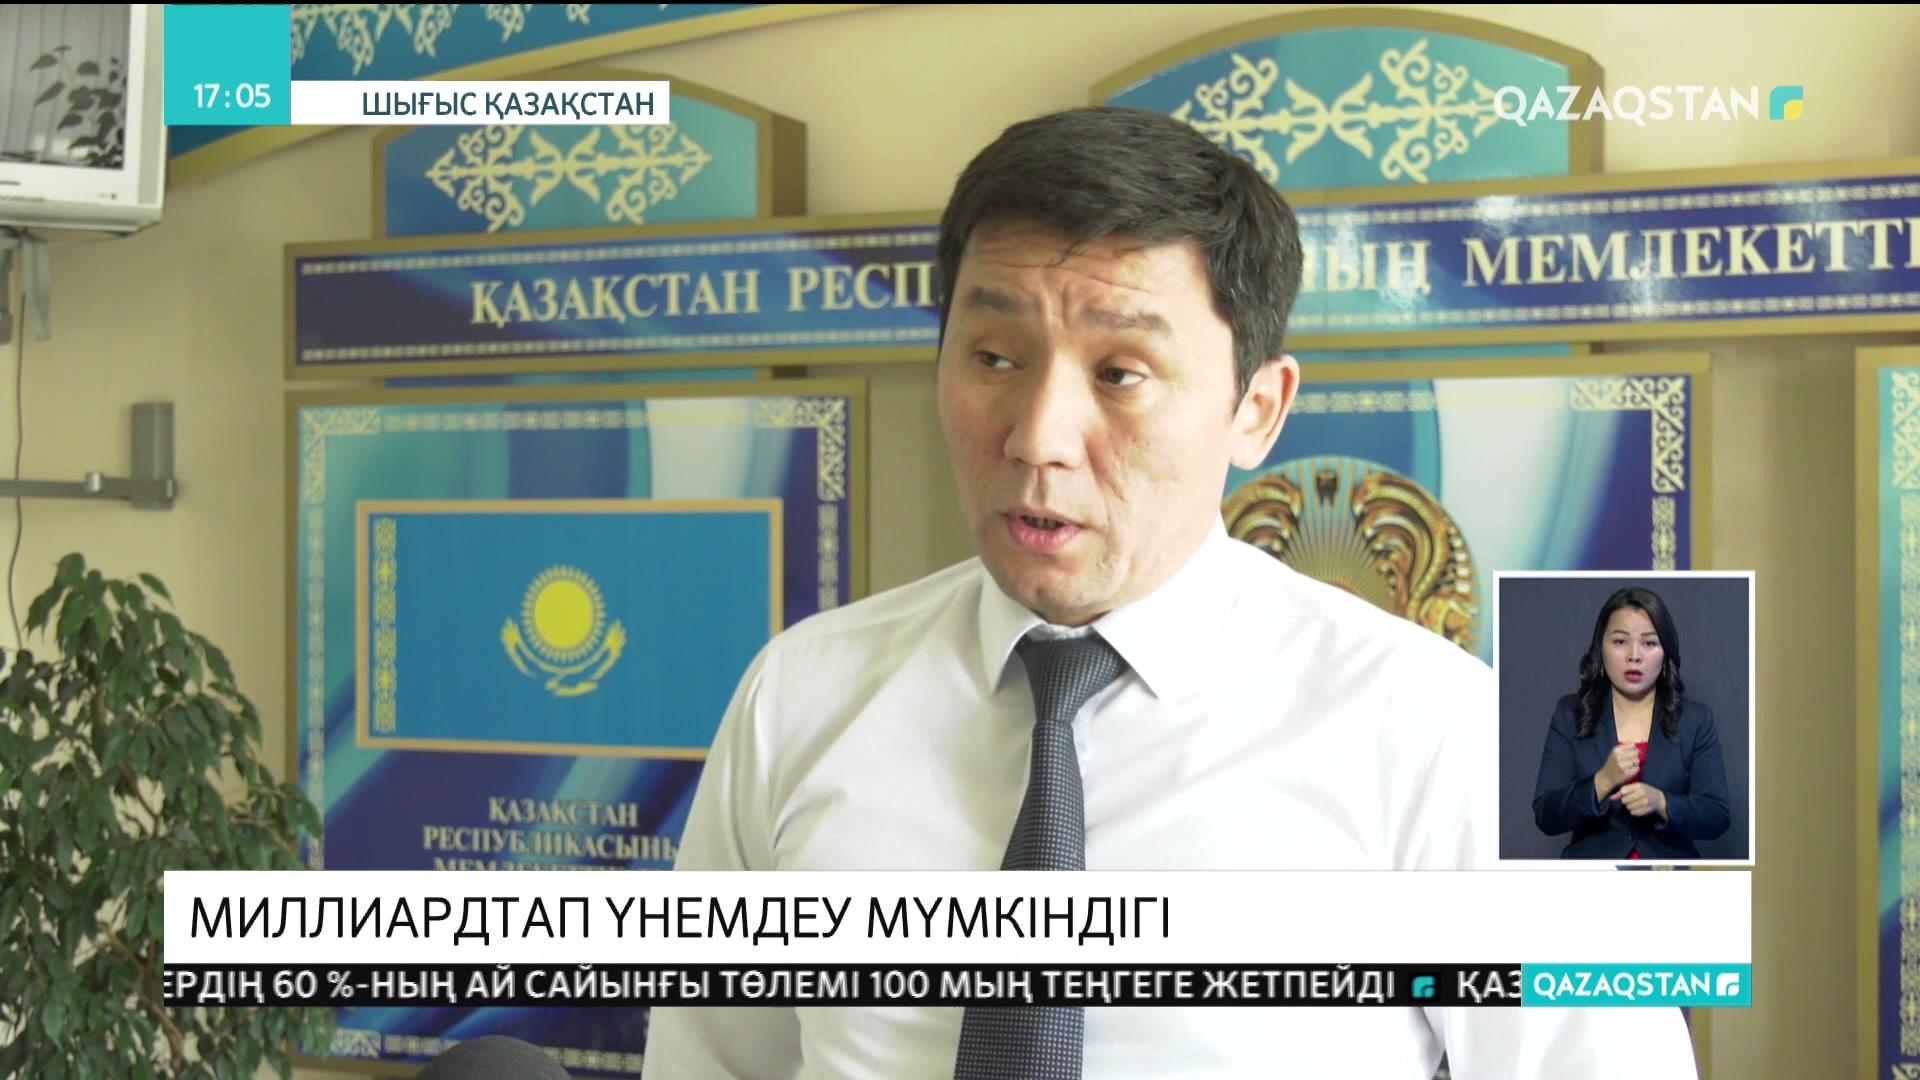 Алматы сату ойын автоматтары